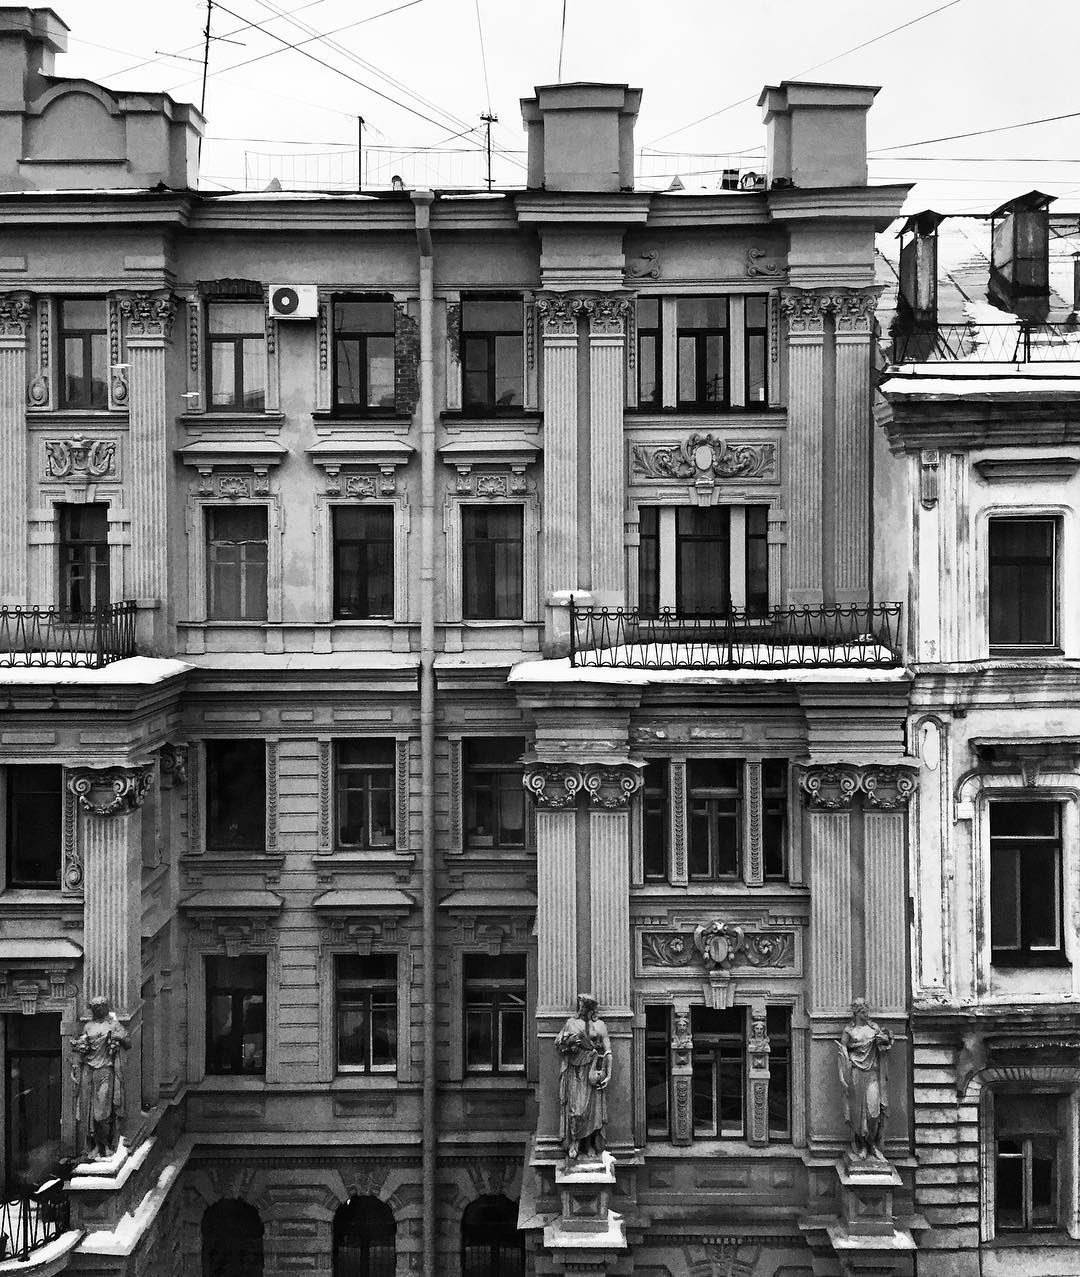 Вид из окна бутик-отеля 1852